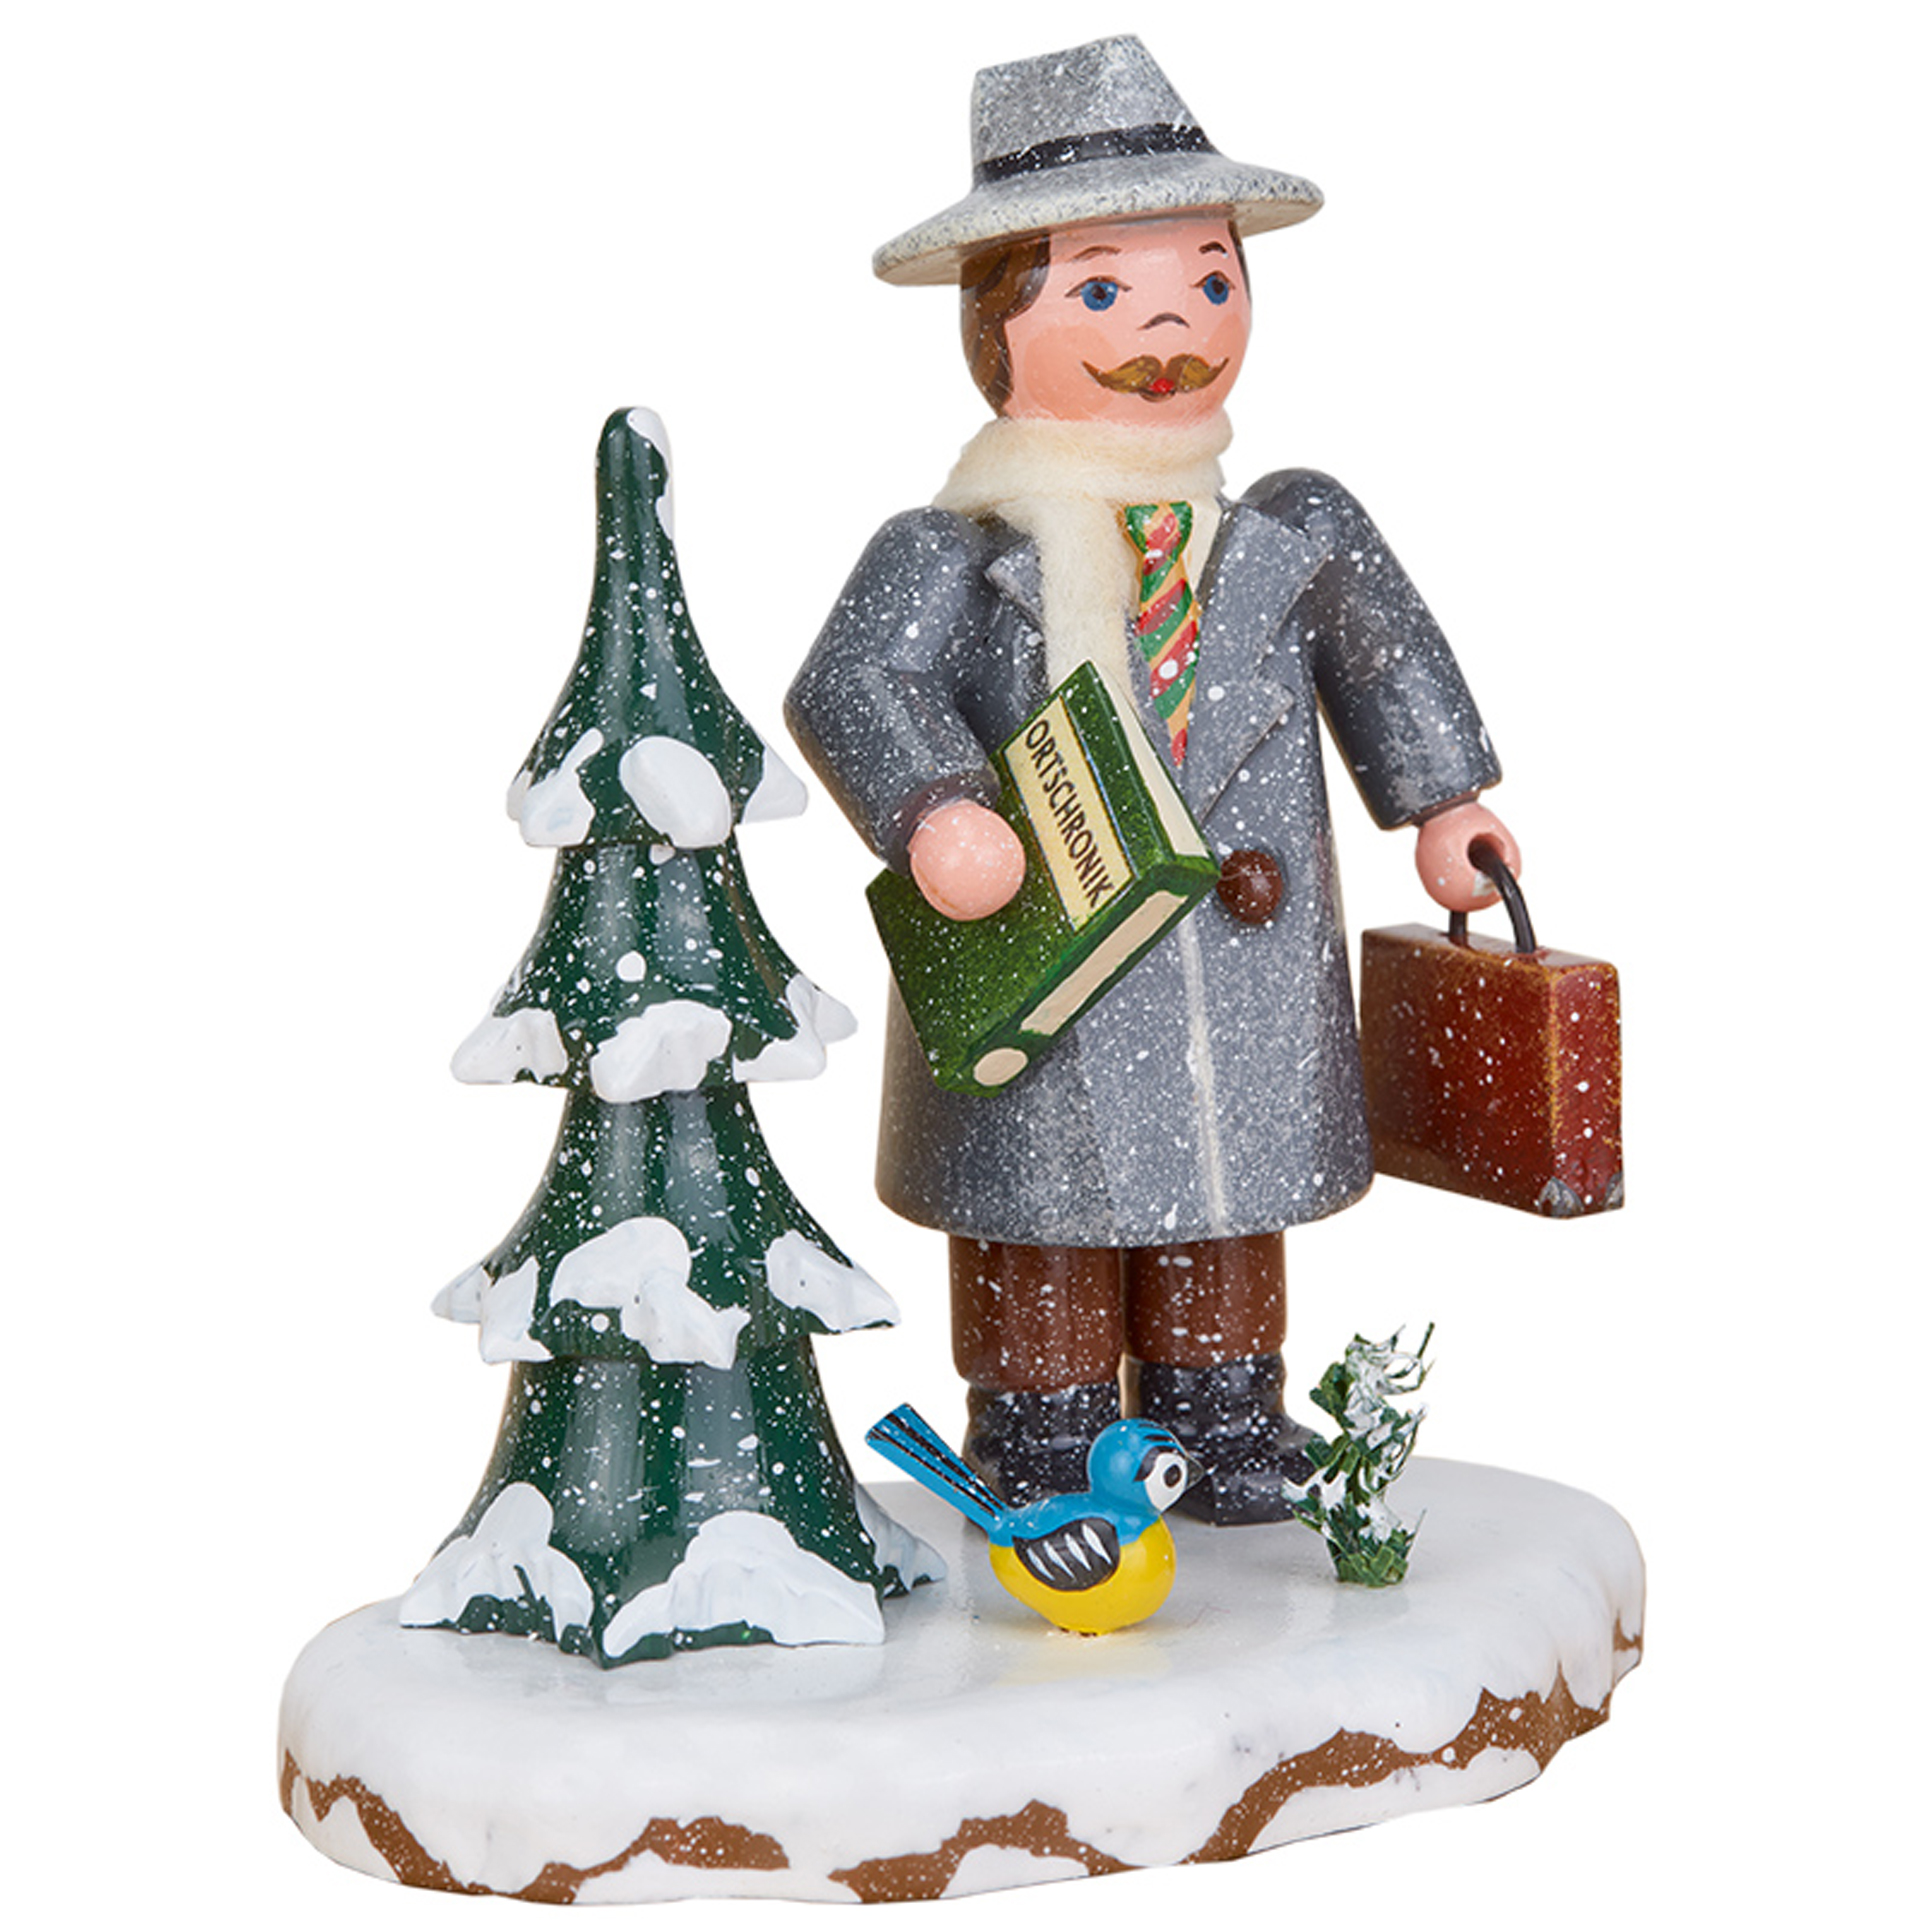 Winterkind Bürgermeister